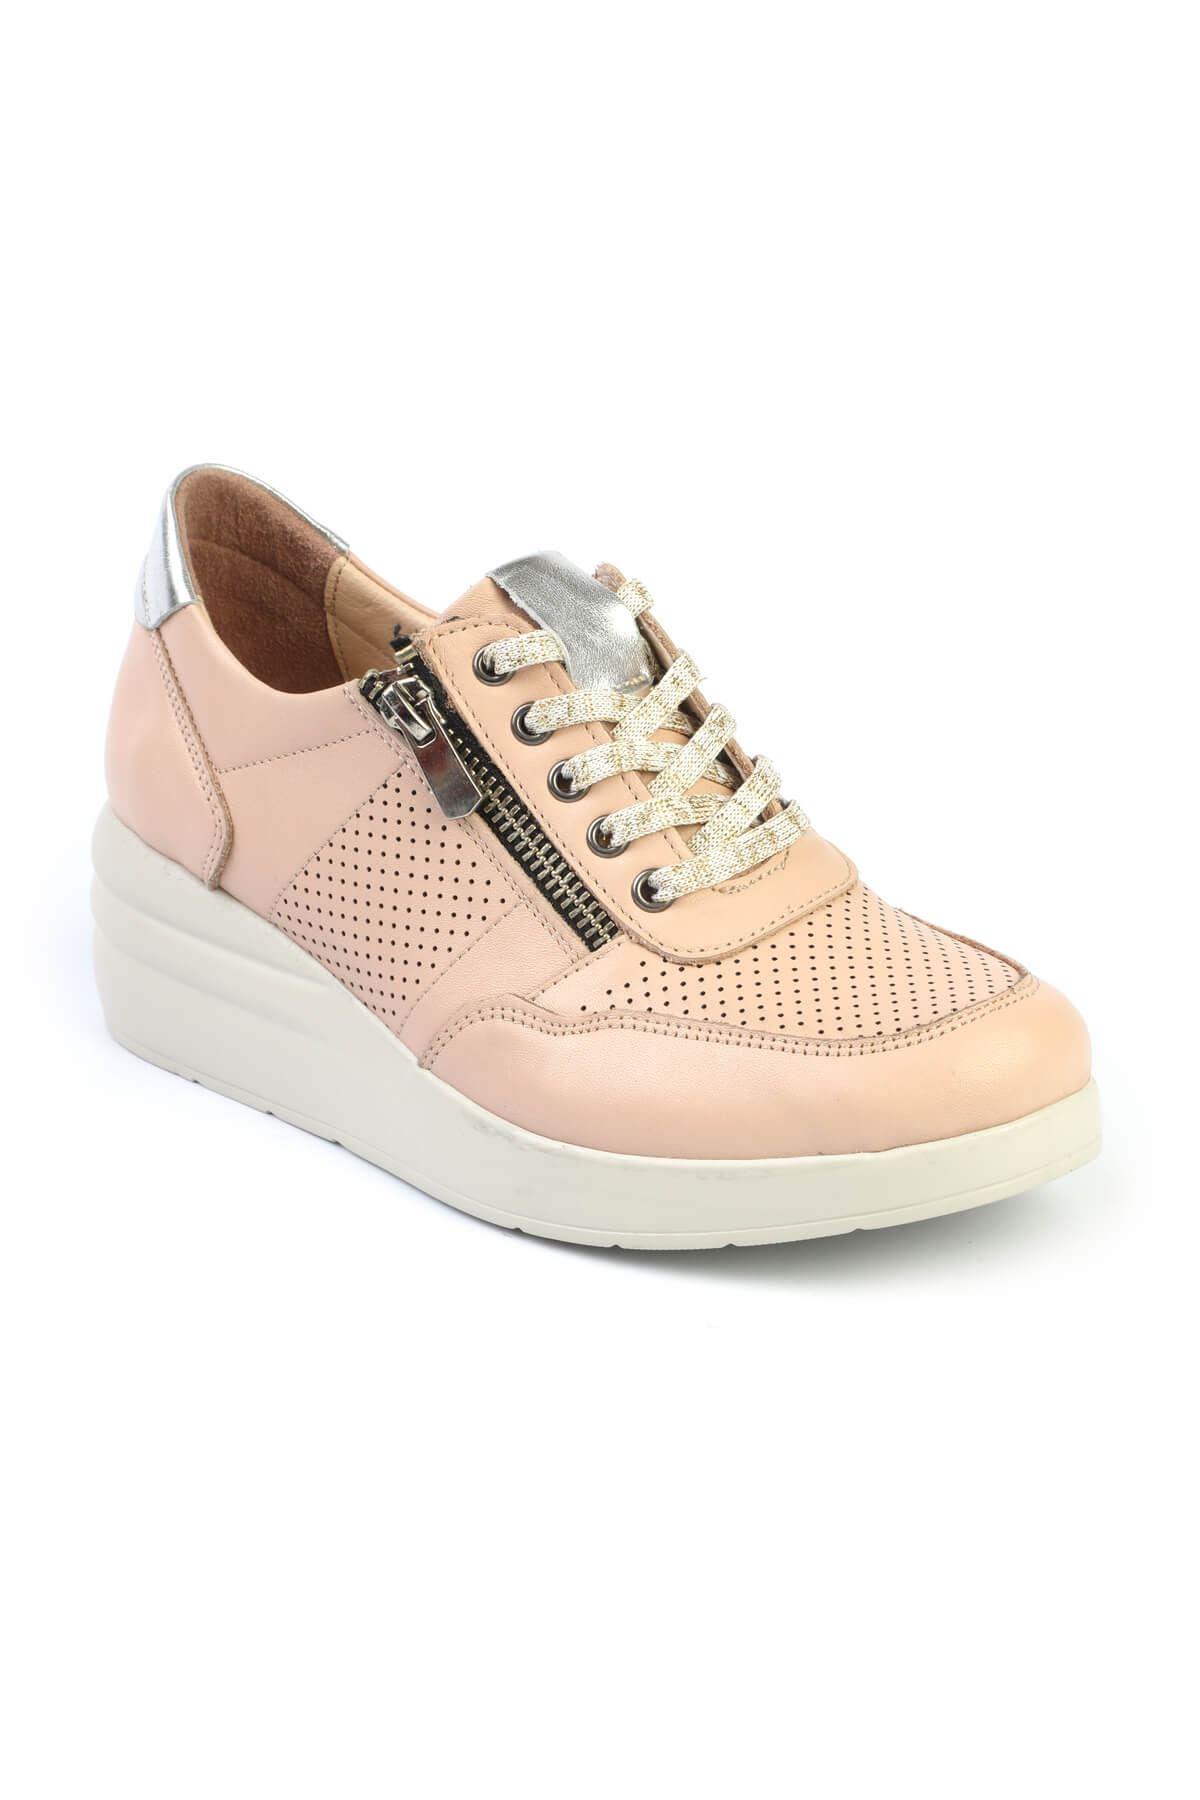 Libero FMS218 Powder Casual Shoes